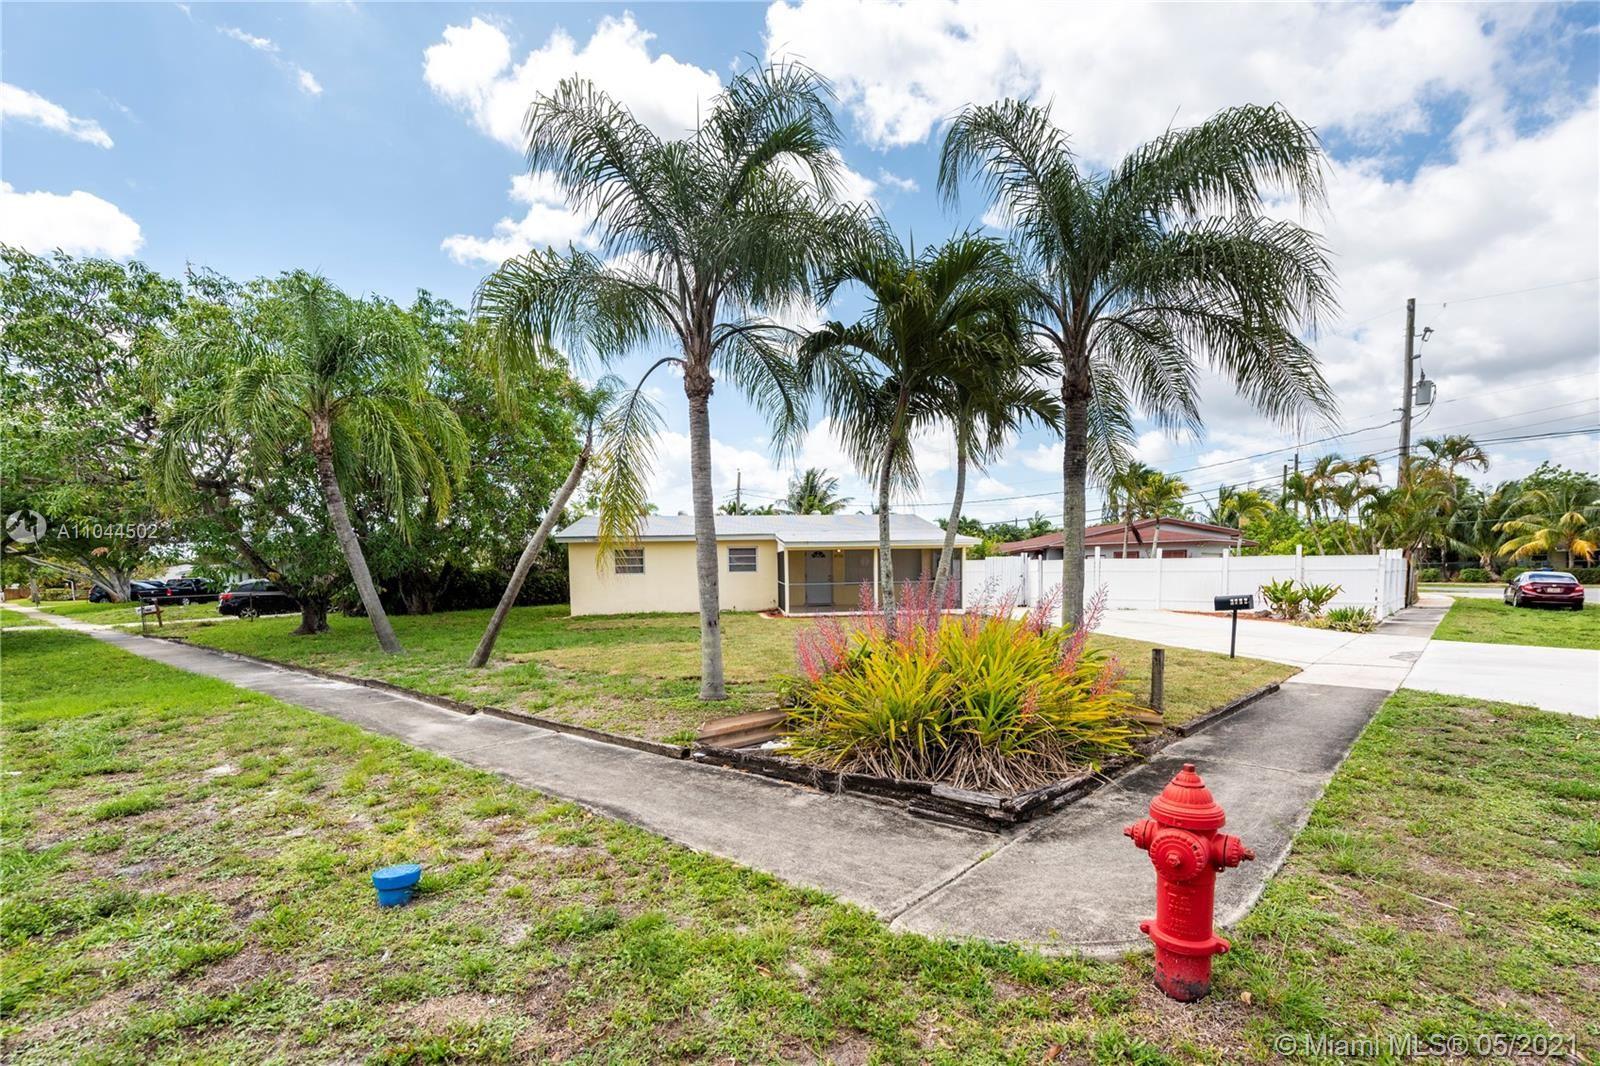 3732 SW 17th St, Fort Lauderdale, FL 33312 - #: A11044502